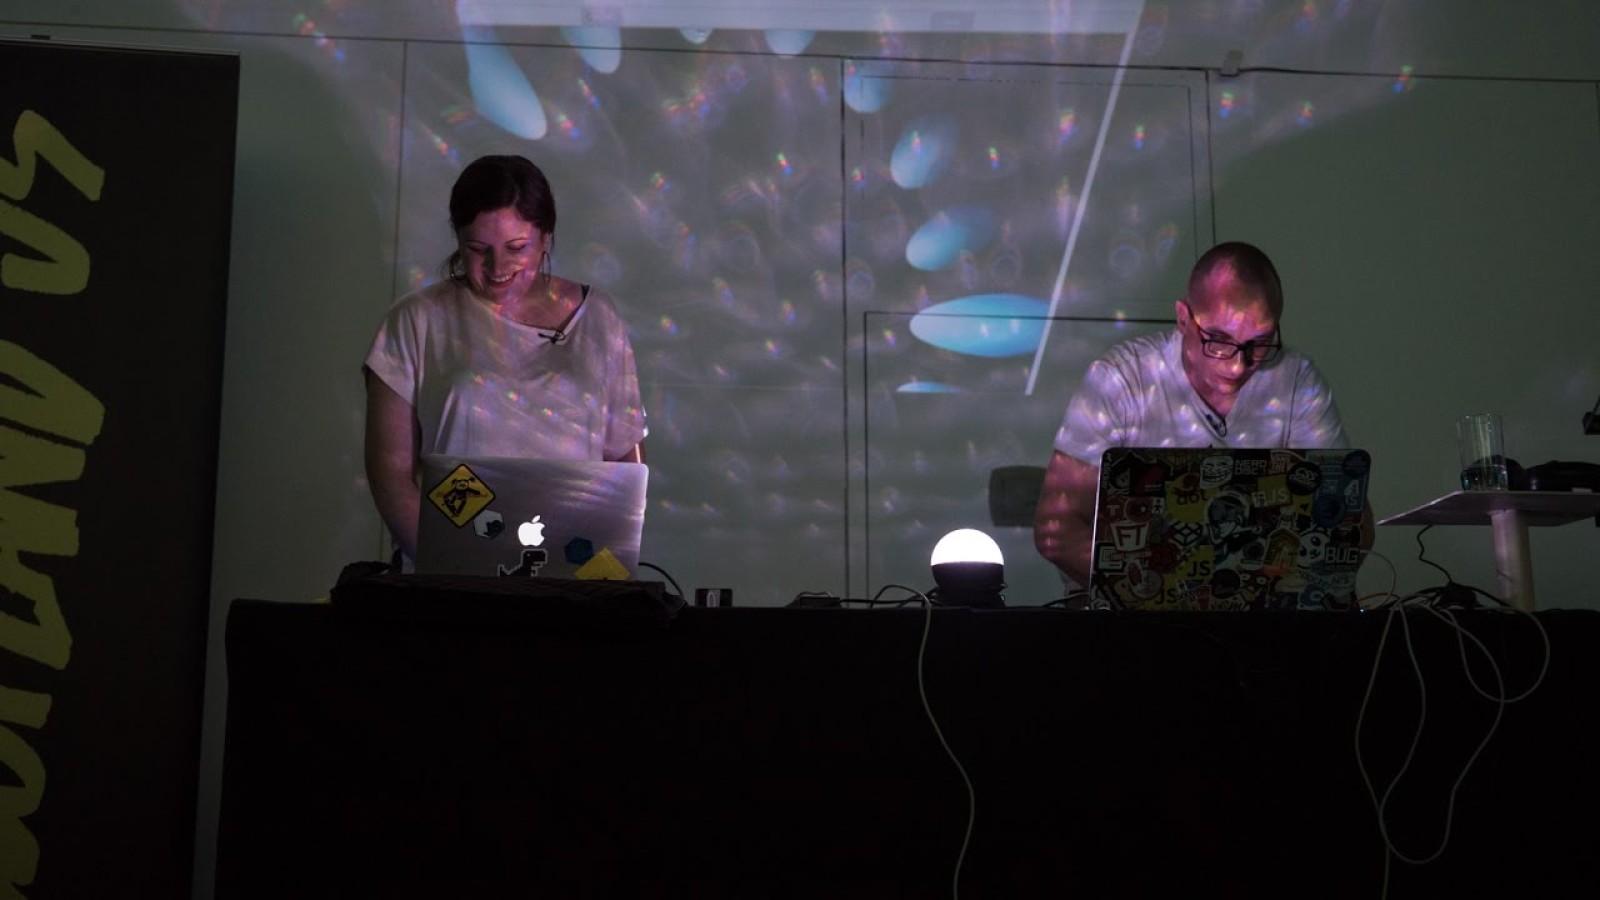 { Live : JS } Performance